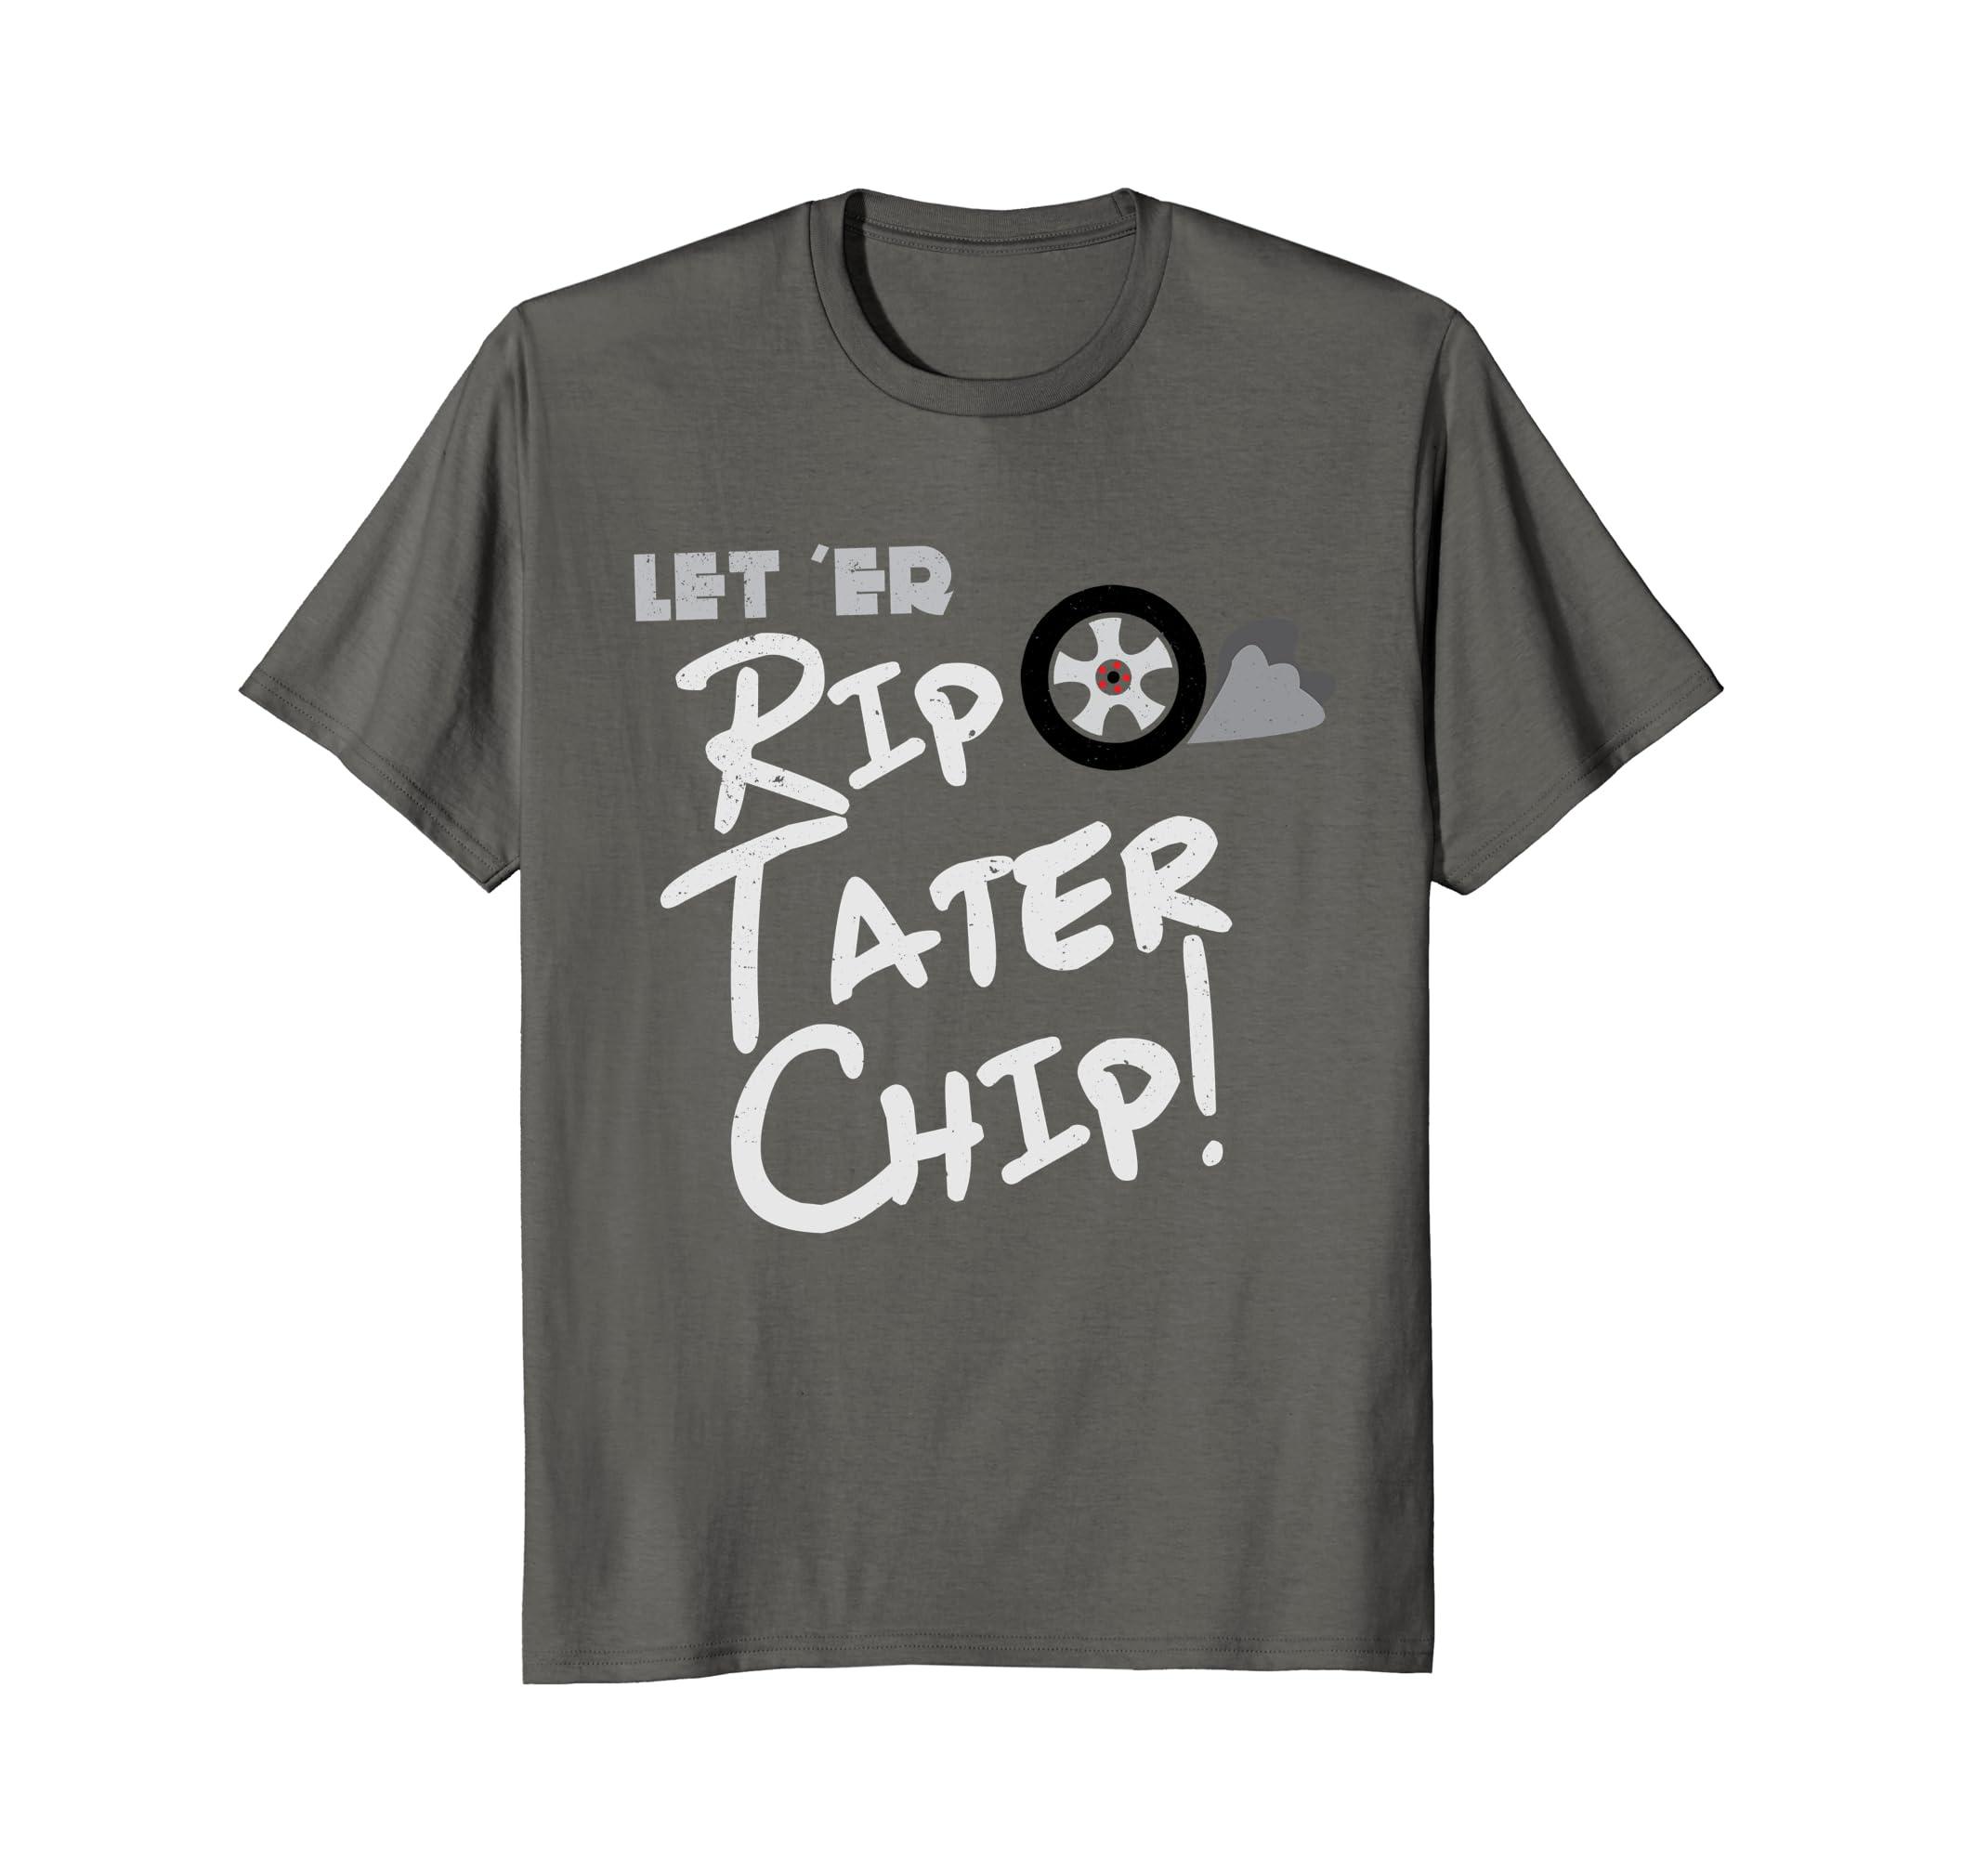 ca36b4384b5ce Let her rip tater chip shirt